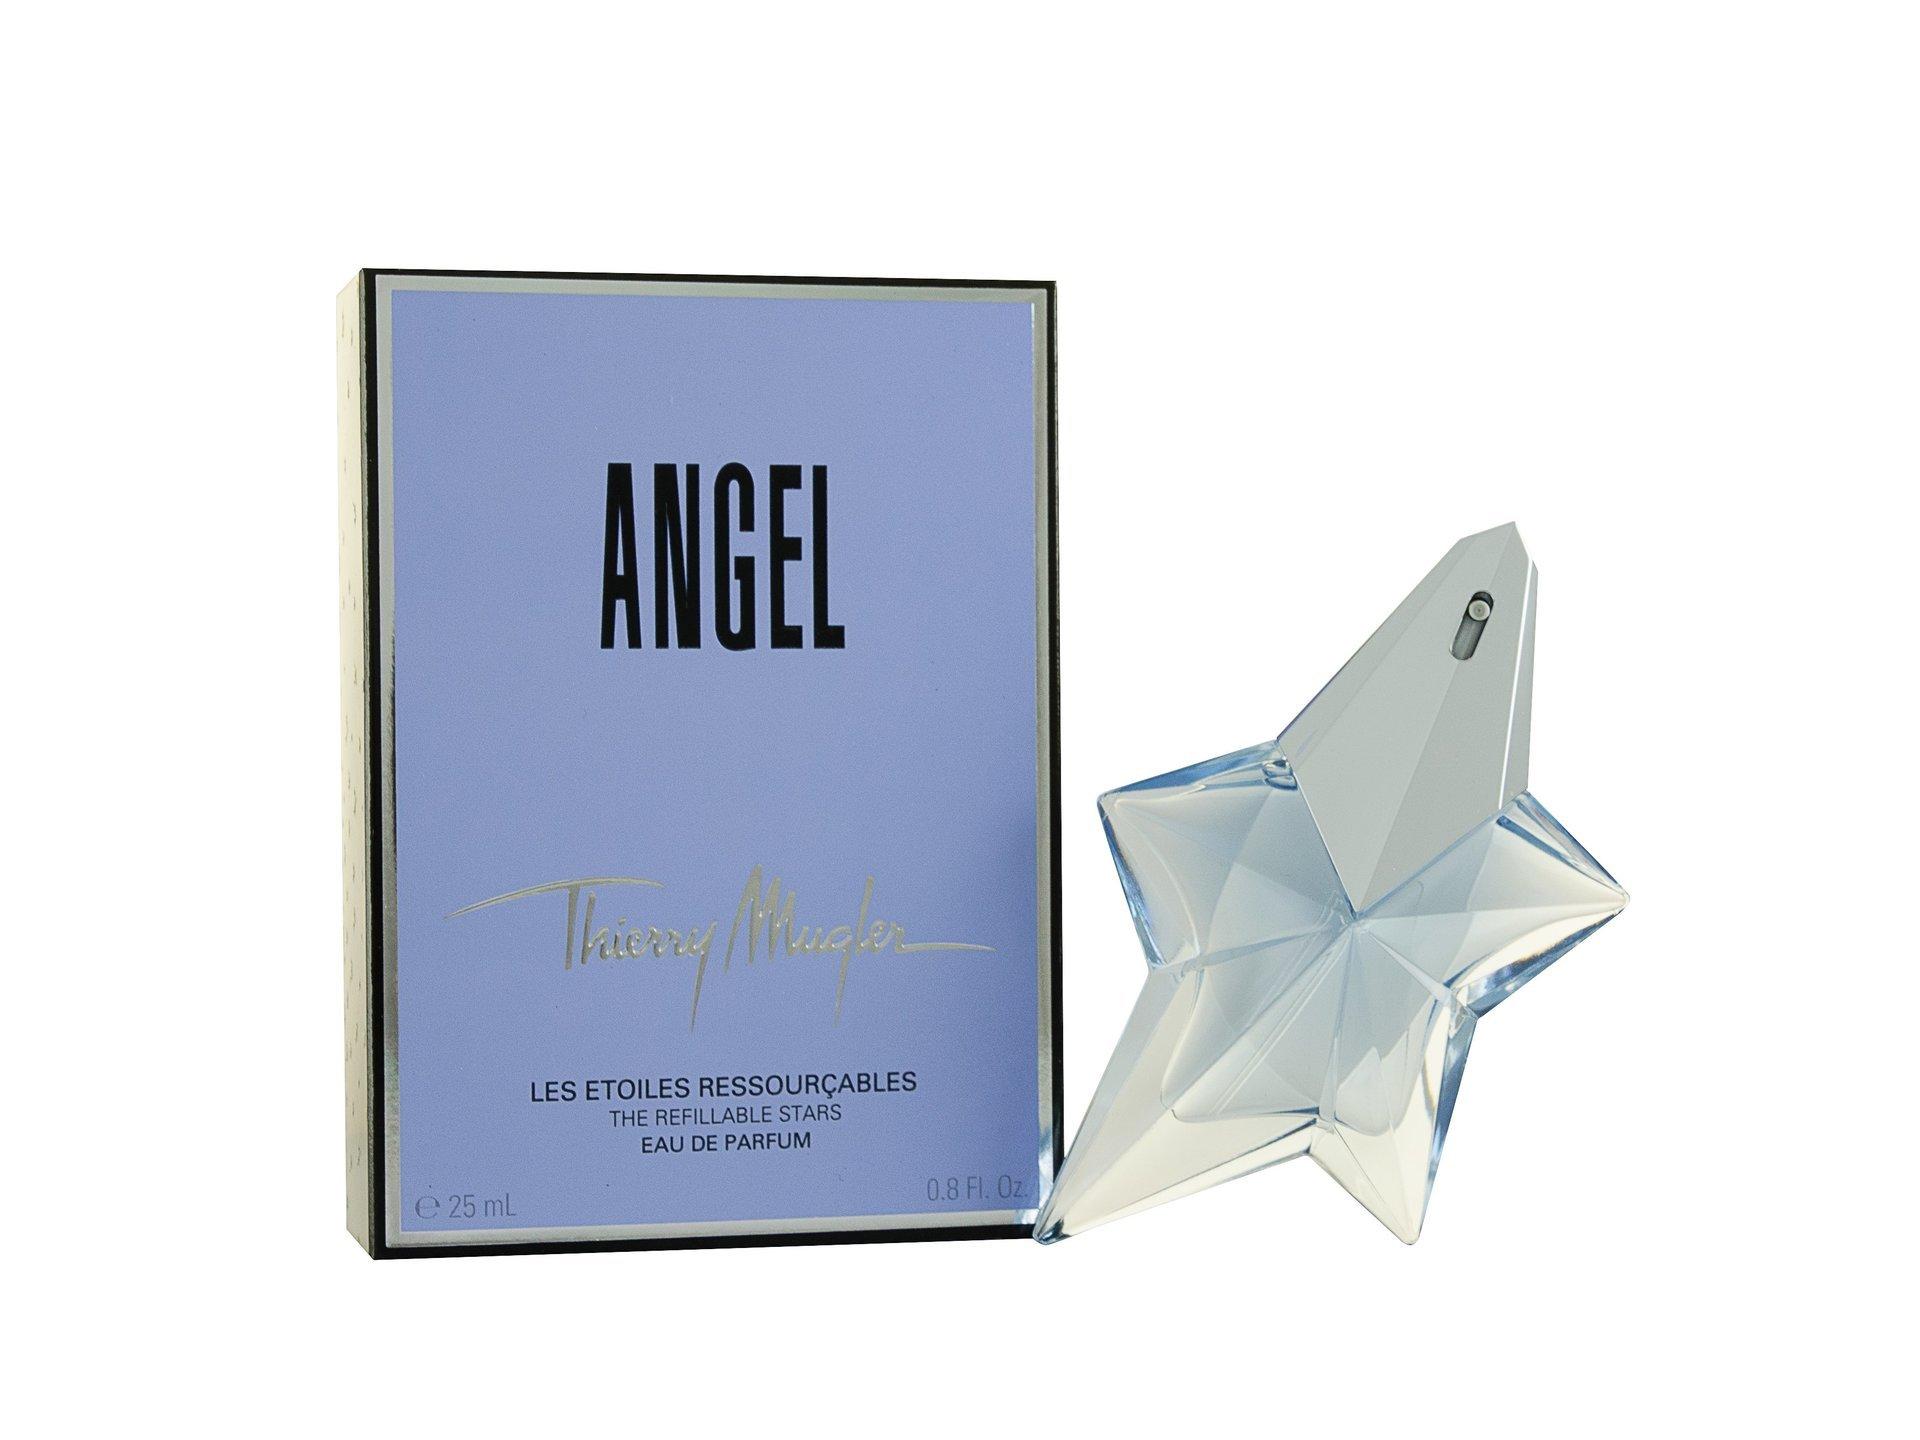 Angel Edp 25ml Refillable